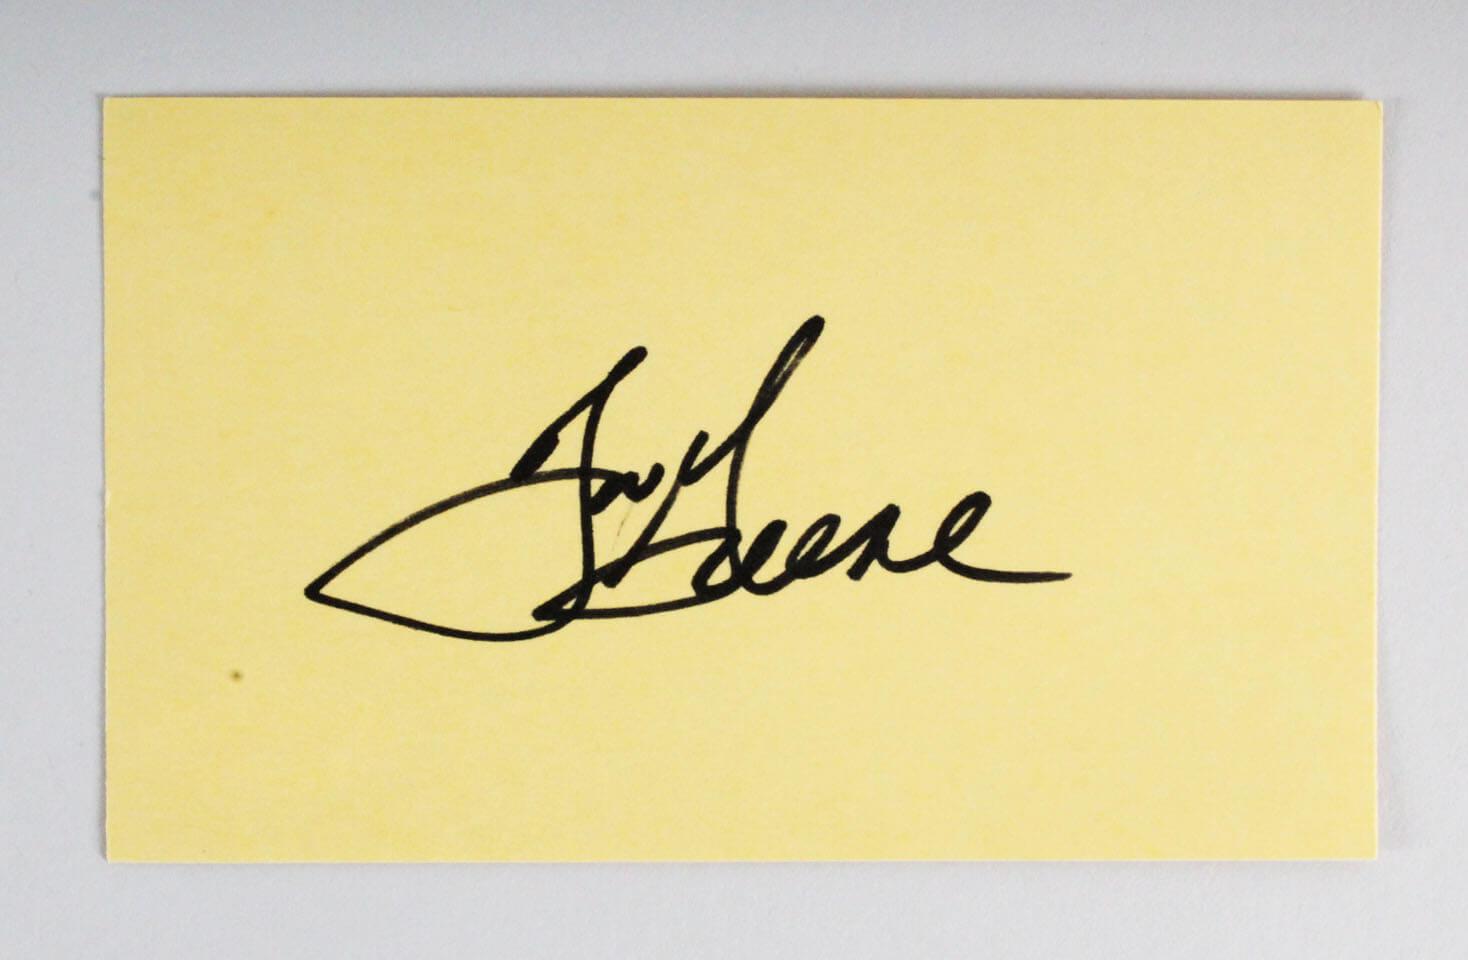 new arrivals 2a9c4 c72e6 Joe Greene Signed 3x5 Index Card - COA JSA